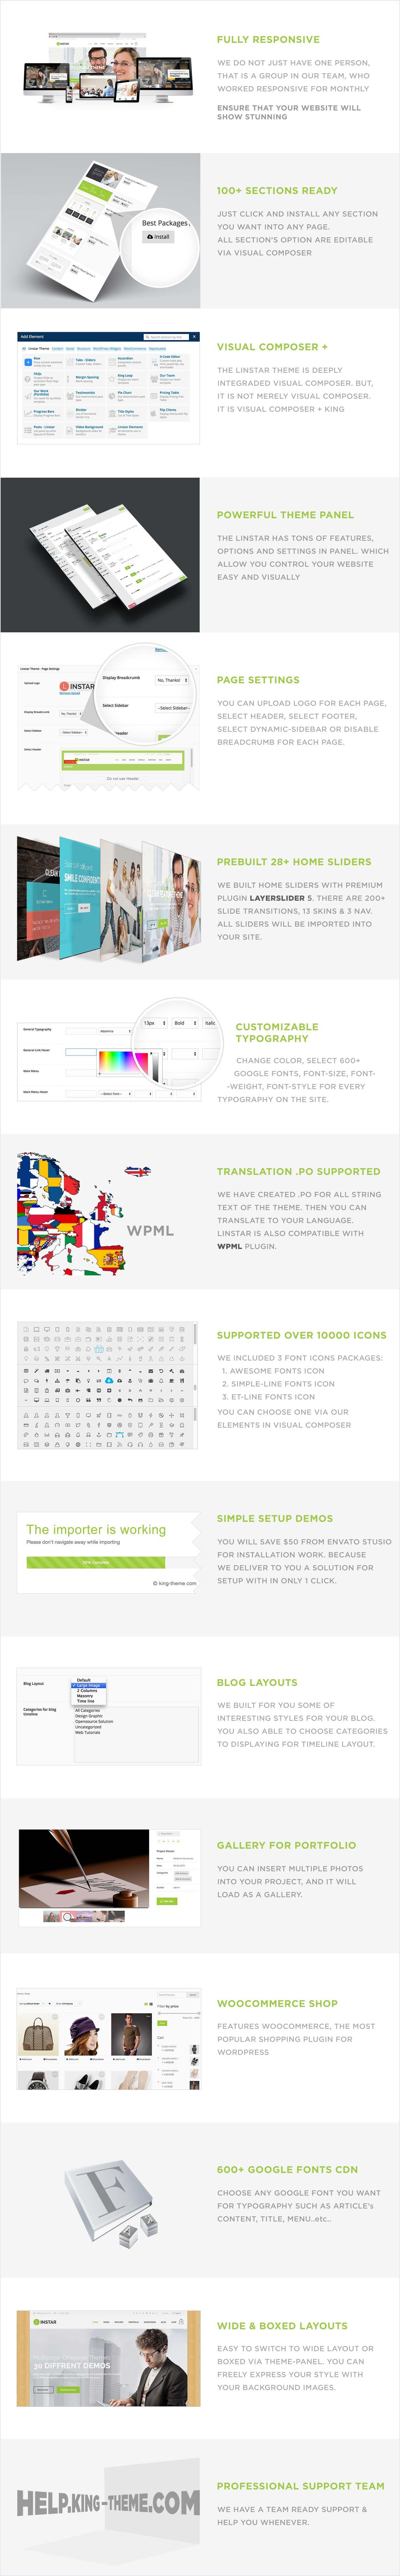 des6 - Linstar - MultiPurpose WordPress Theme